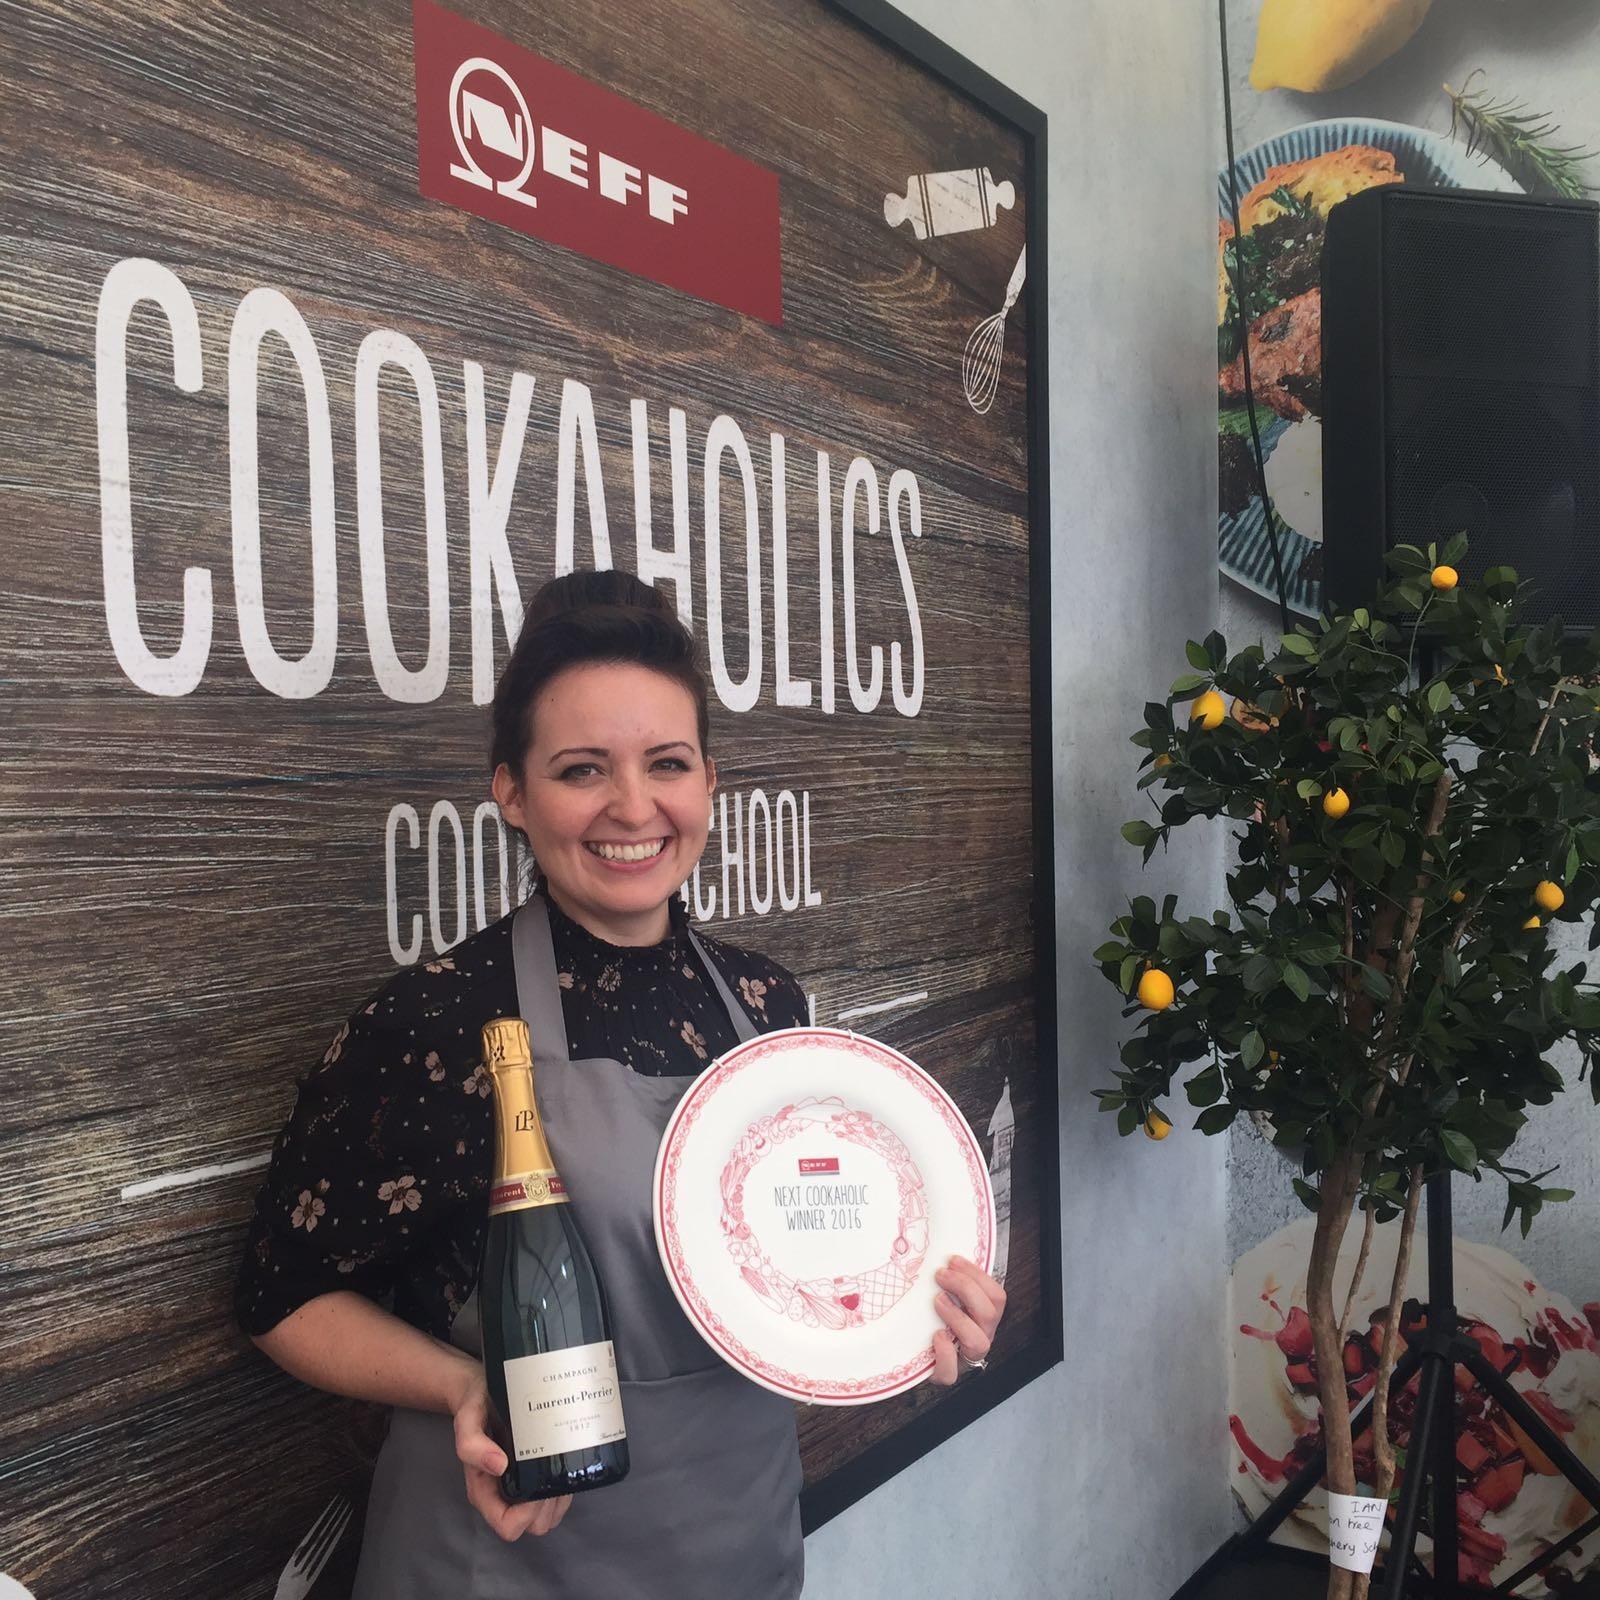 Nicky Corbishley with award